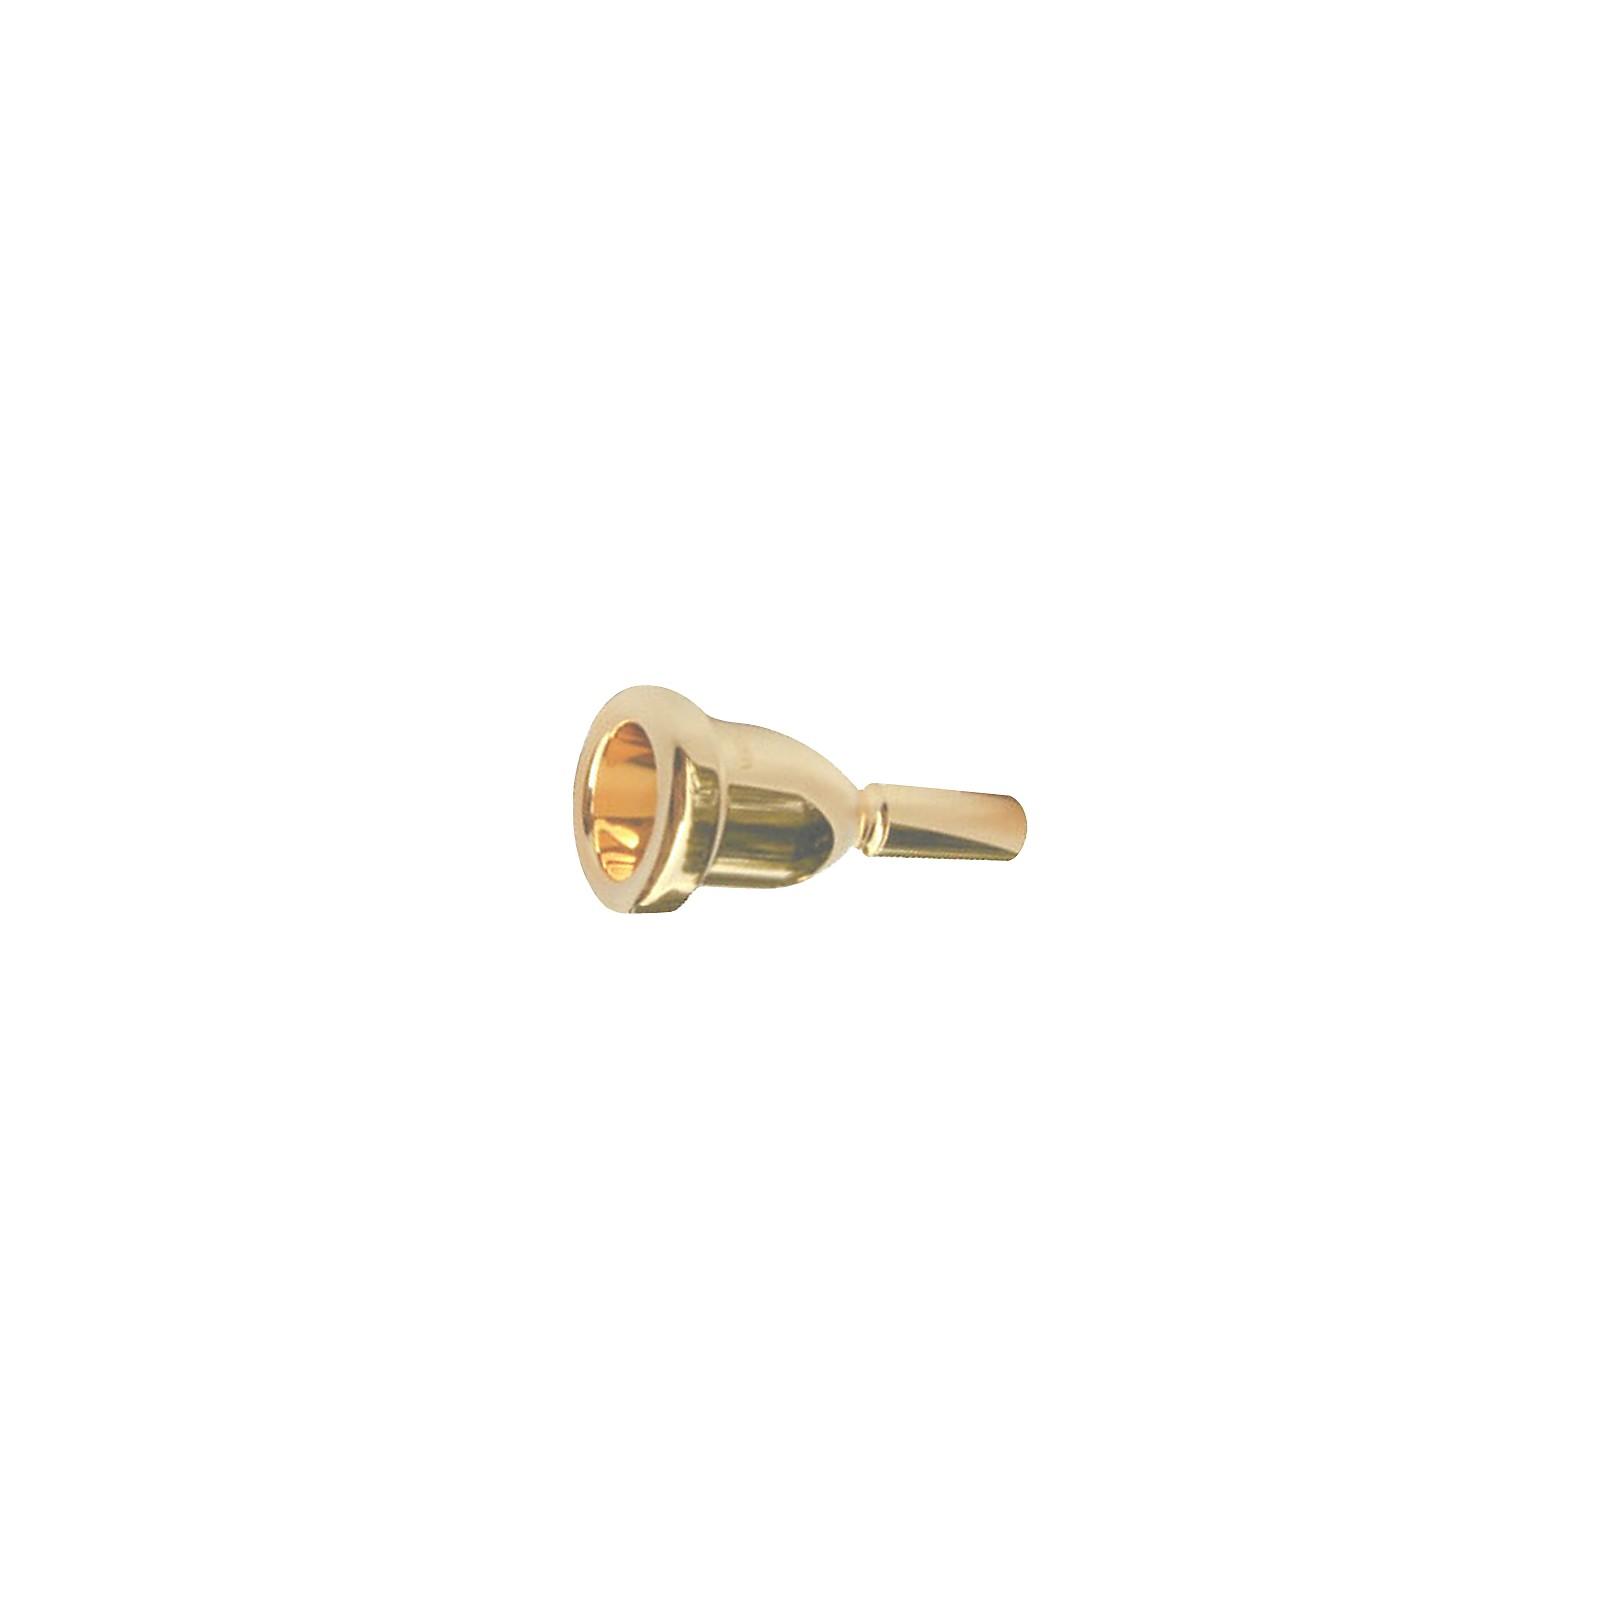 Bach Mega Tone Large Shank Trombone Mouthpiece in Gold